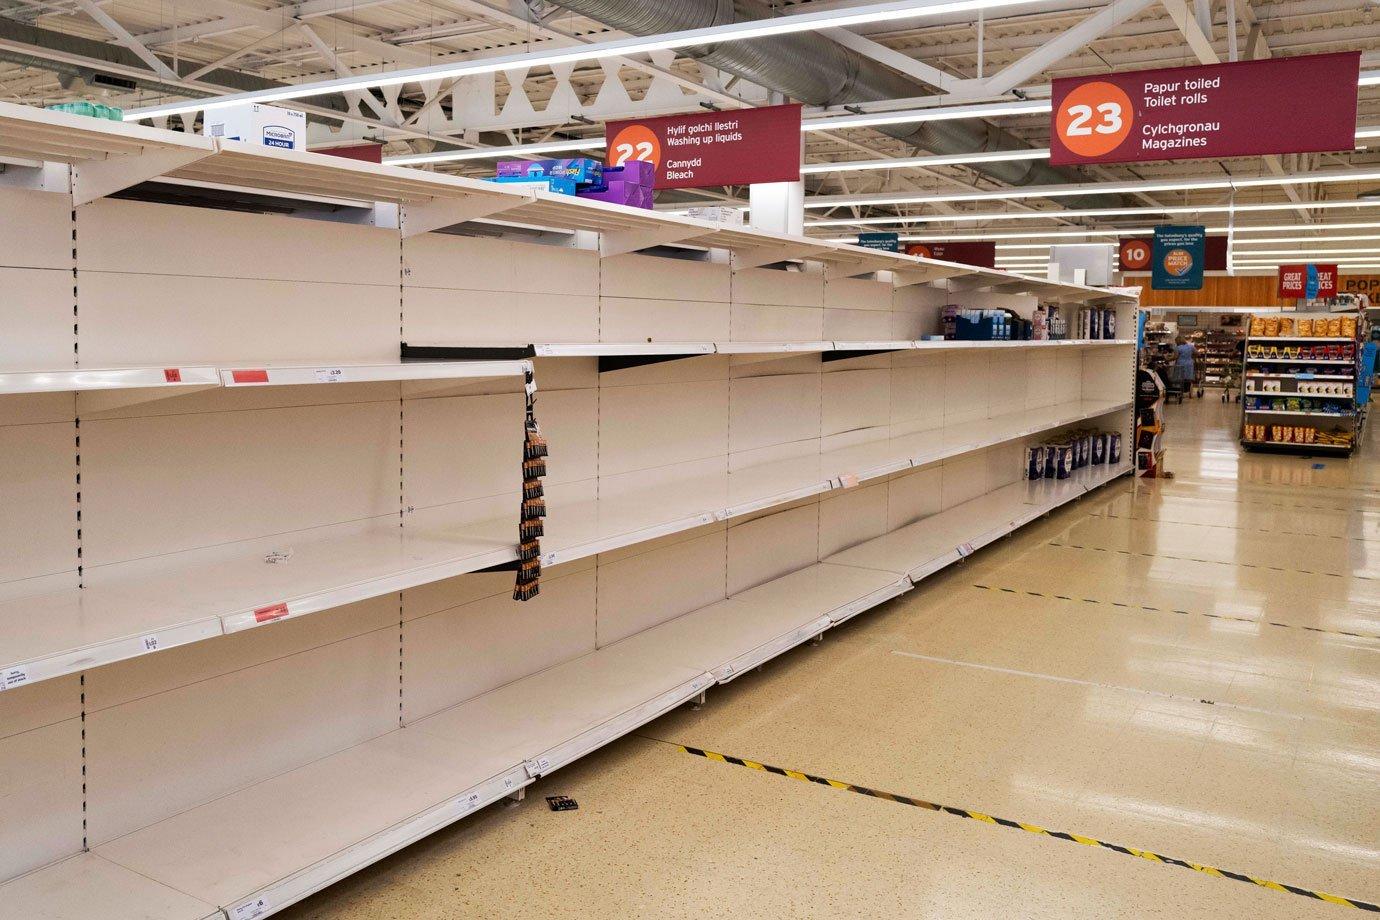 GettyImages 1234179100 No milkshake at McDonald's and chicken at KFC: the UK crisis